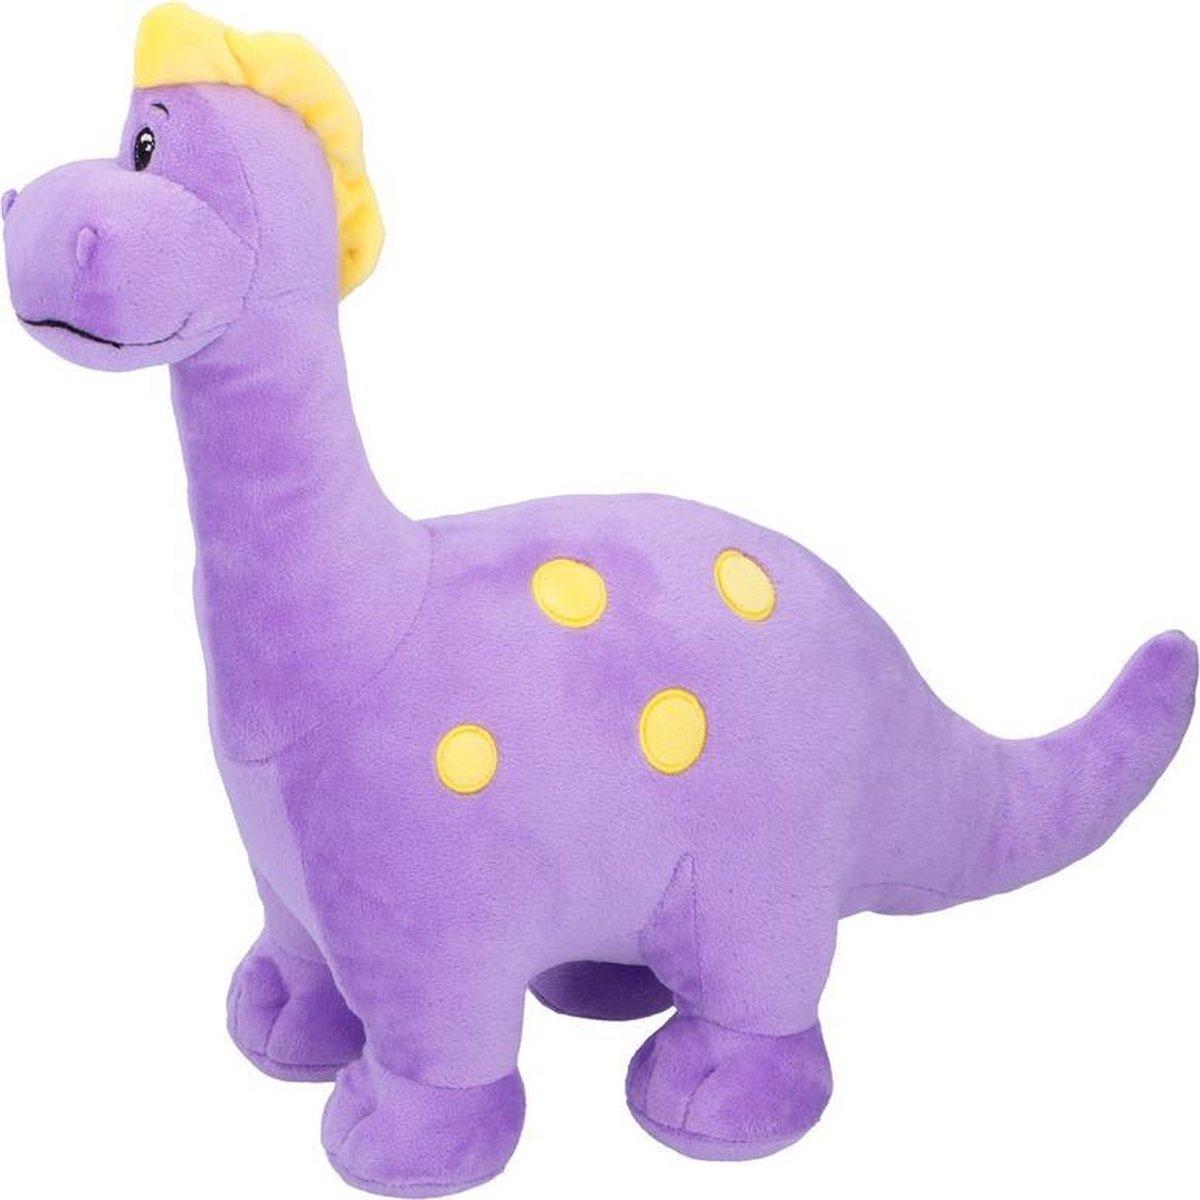 Bol Com Paarse Dinosaurus Knuffel Brontosaurus 37 Cm